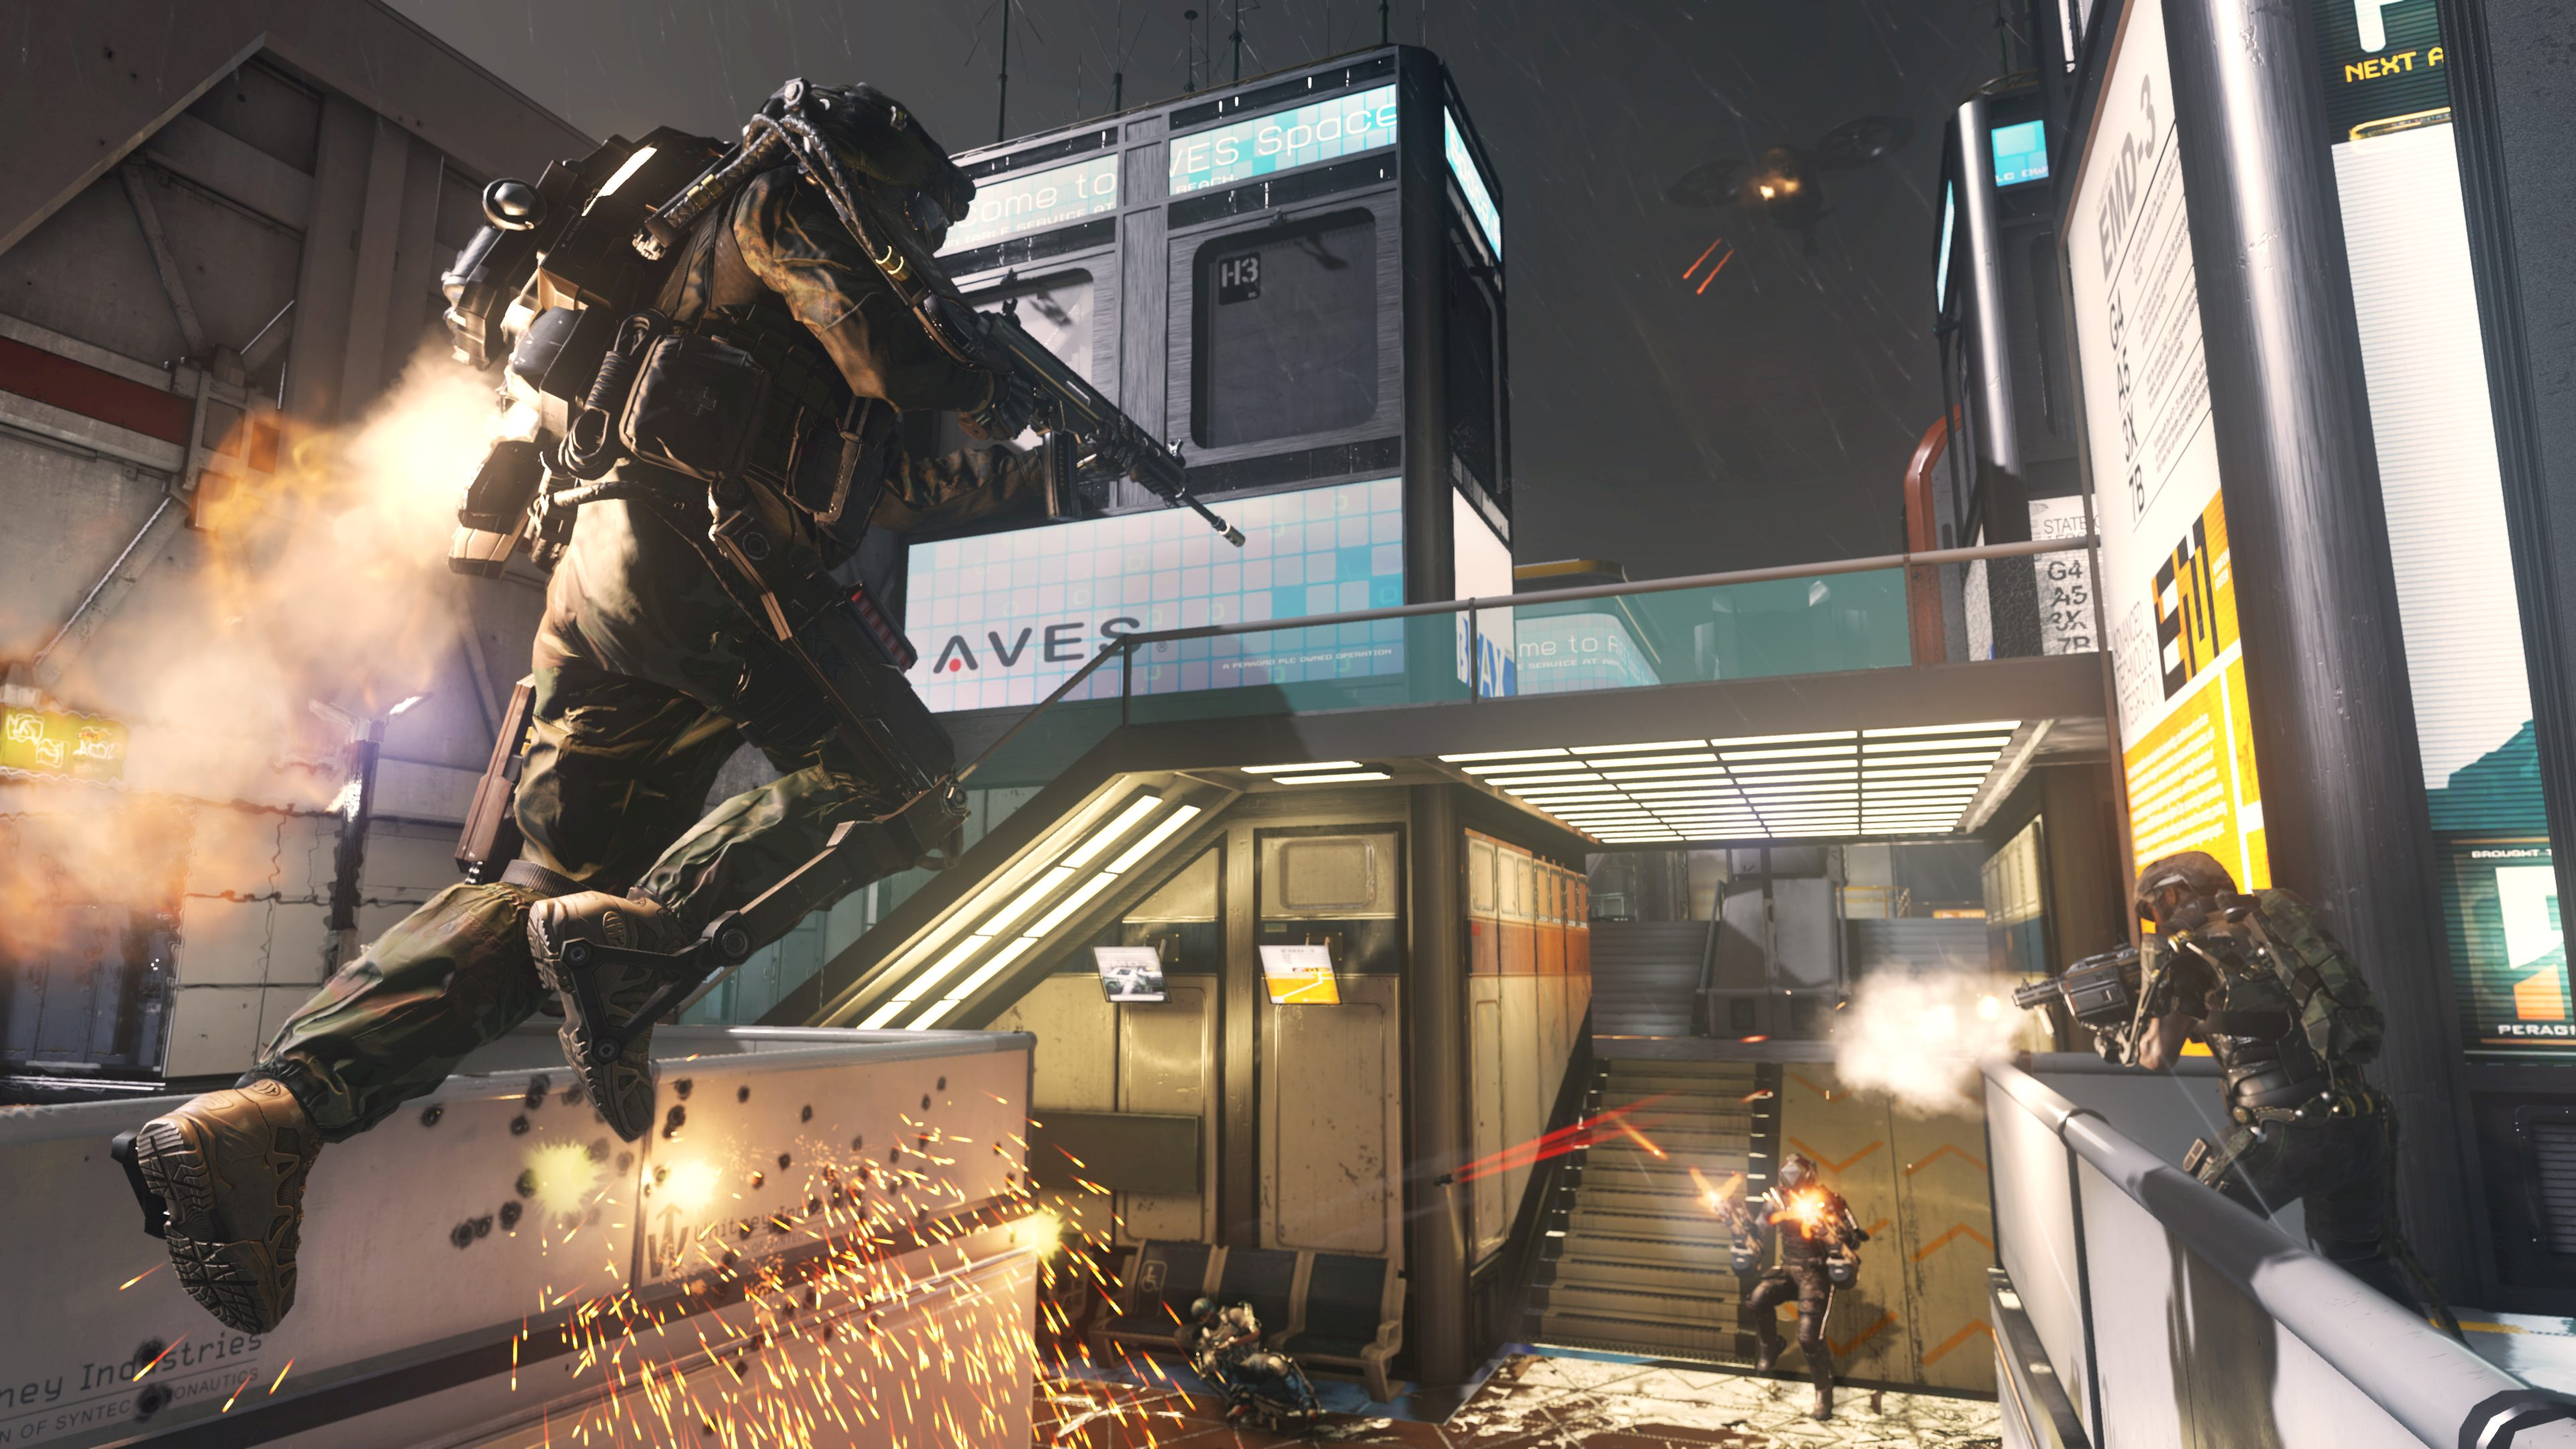 Call-of-Duty-Advanced-Warfare-Multiplayer-Screenshots-2